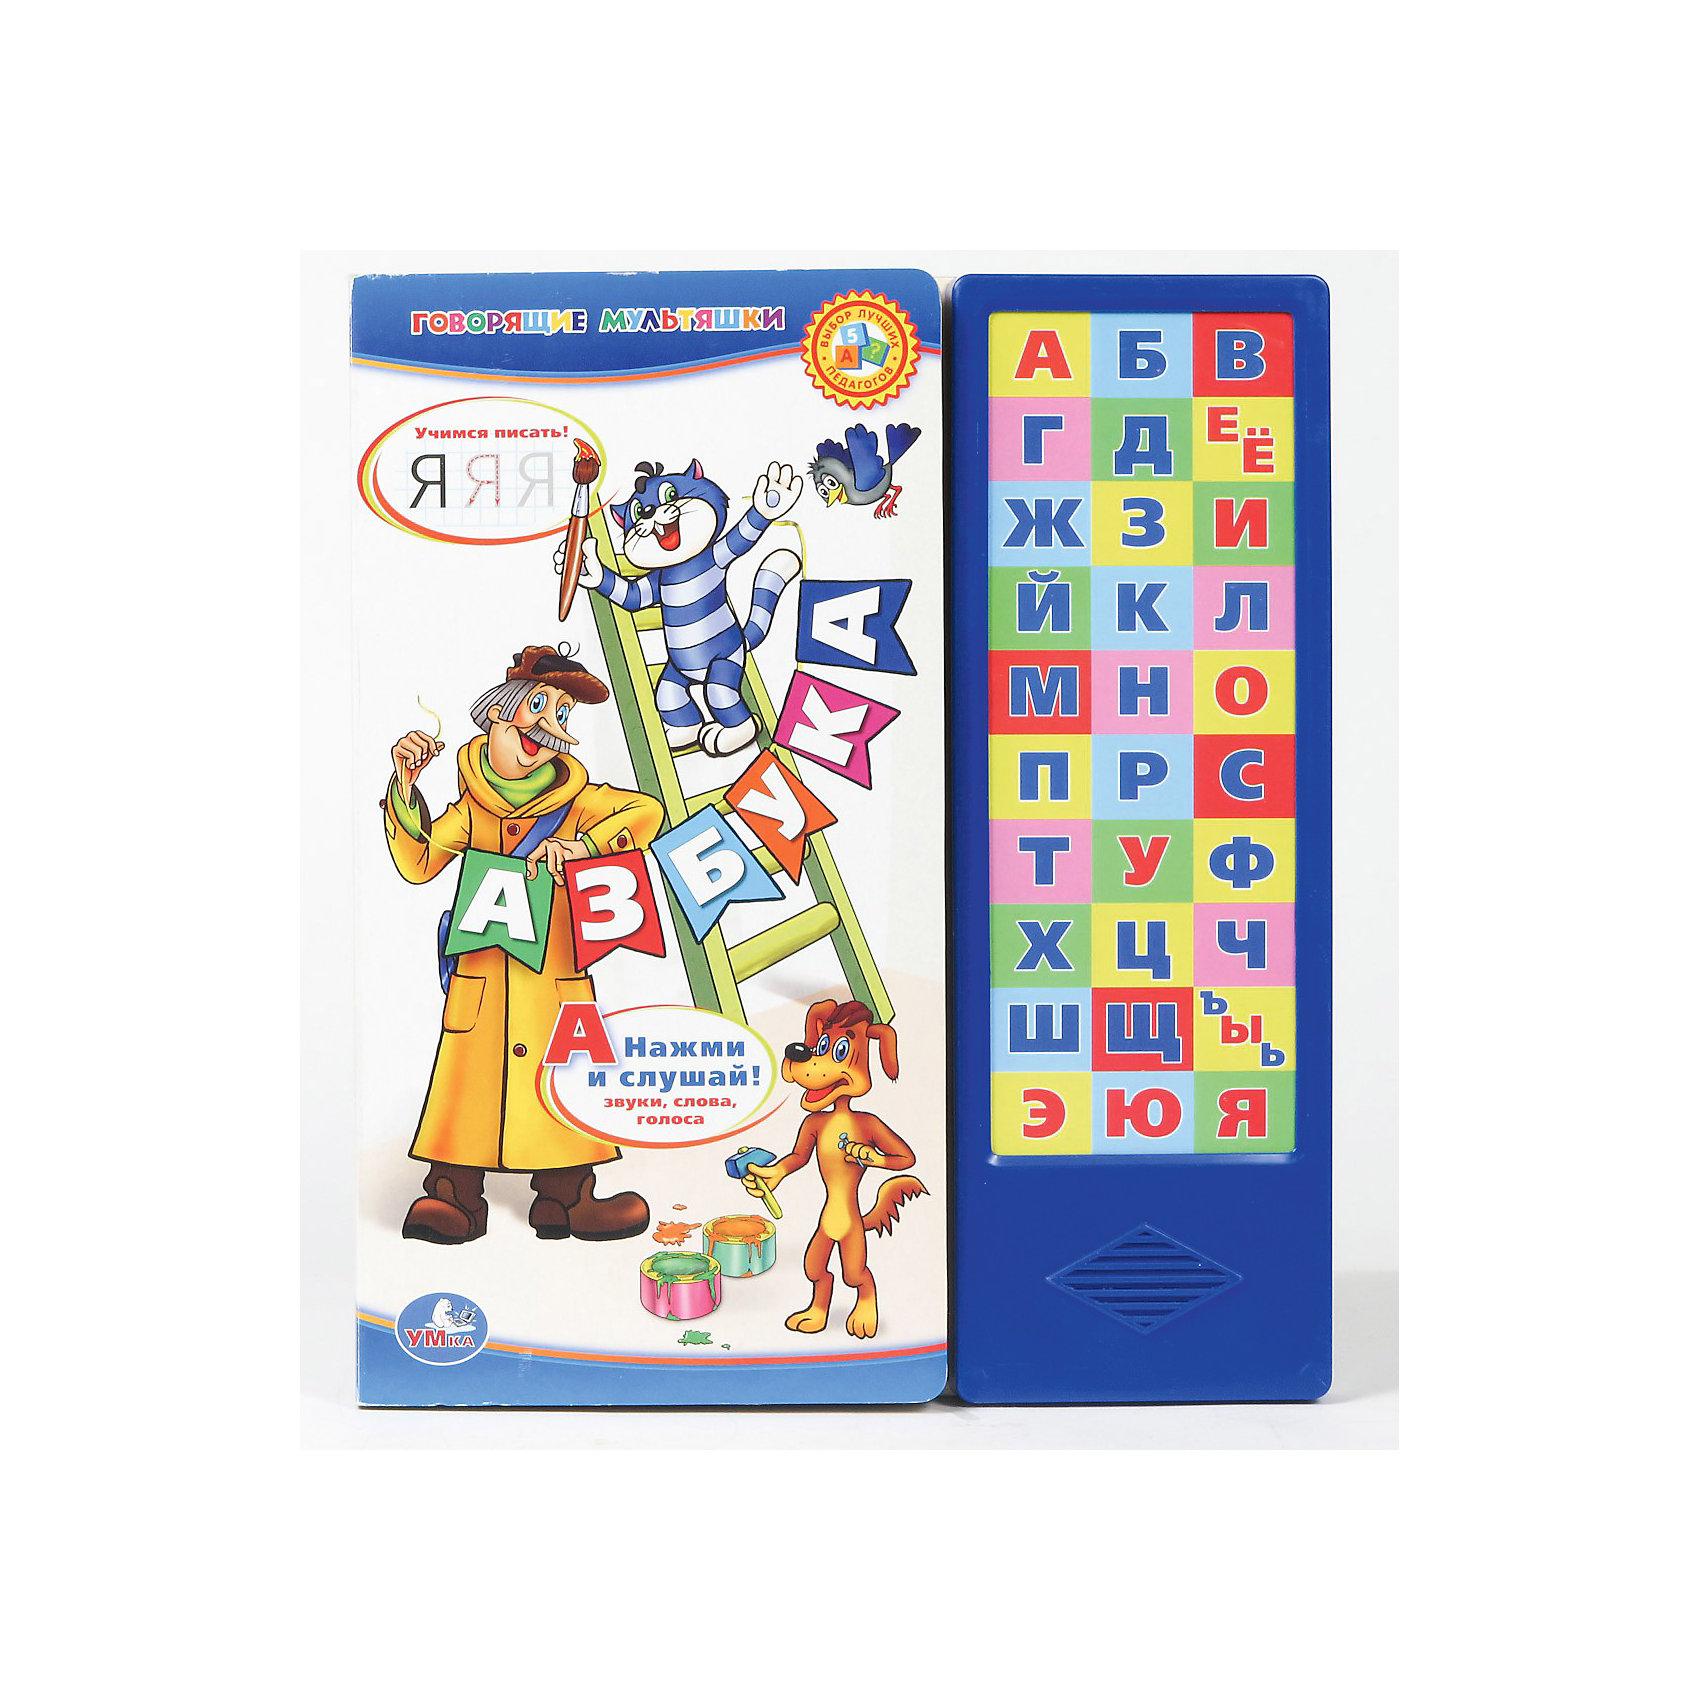 Умка Книга с 33 кнопками Азбука Простоквашино говорящий плакат умка азбука в стихах к чуковский